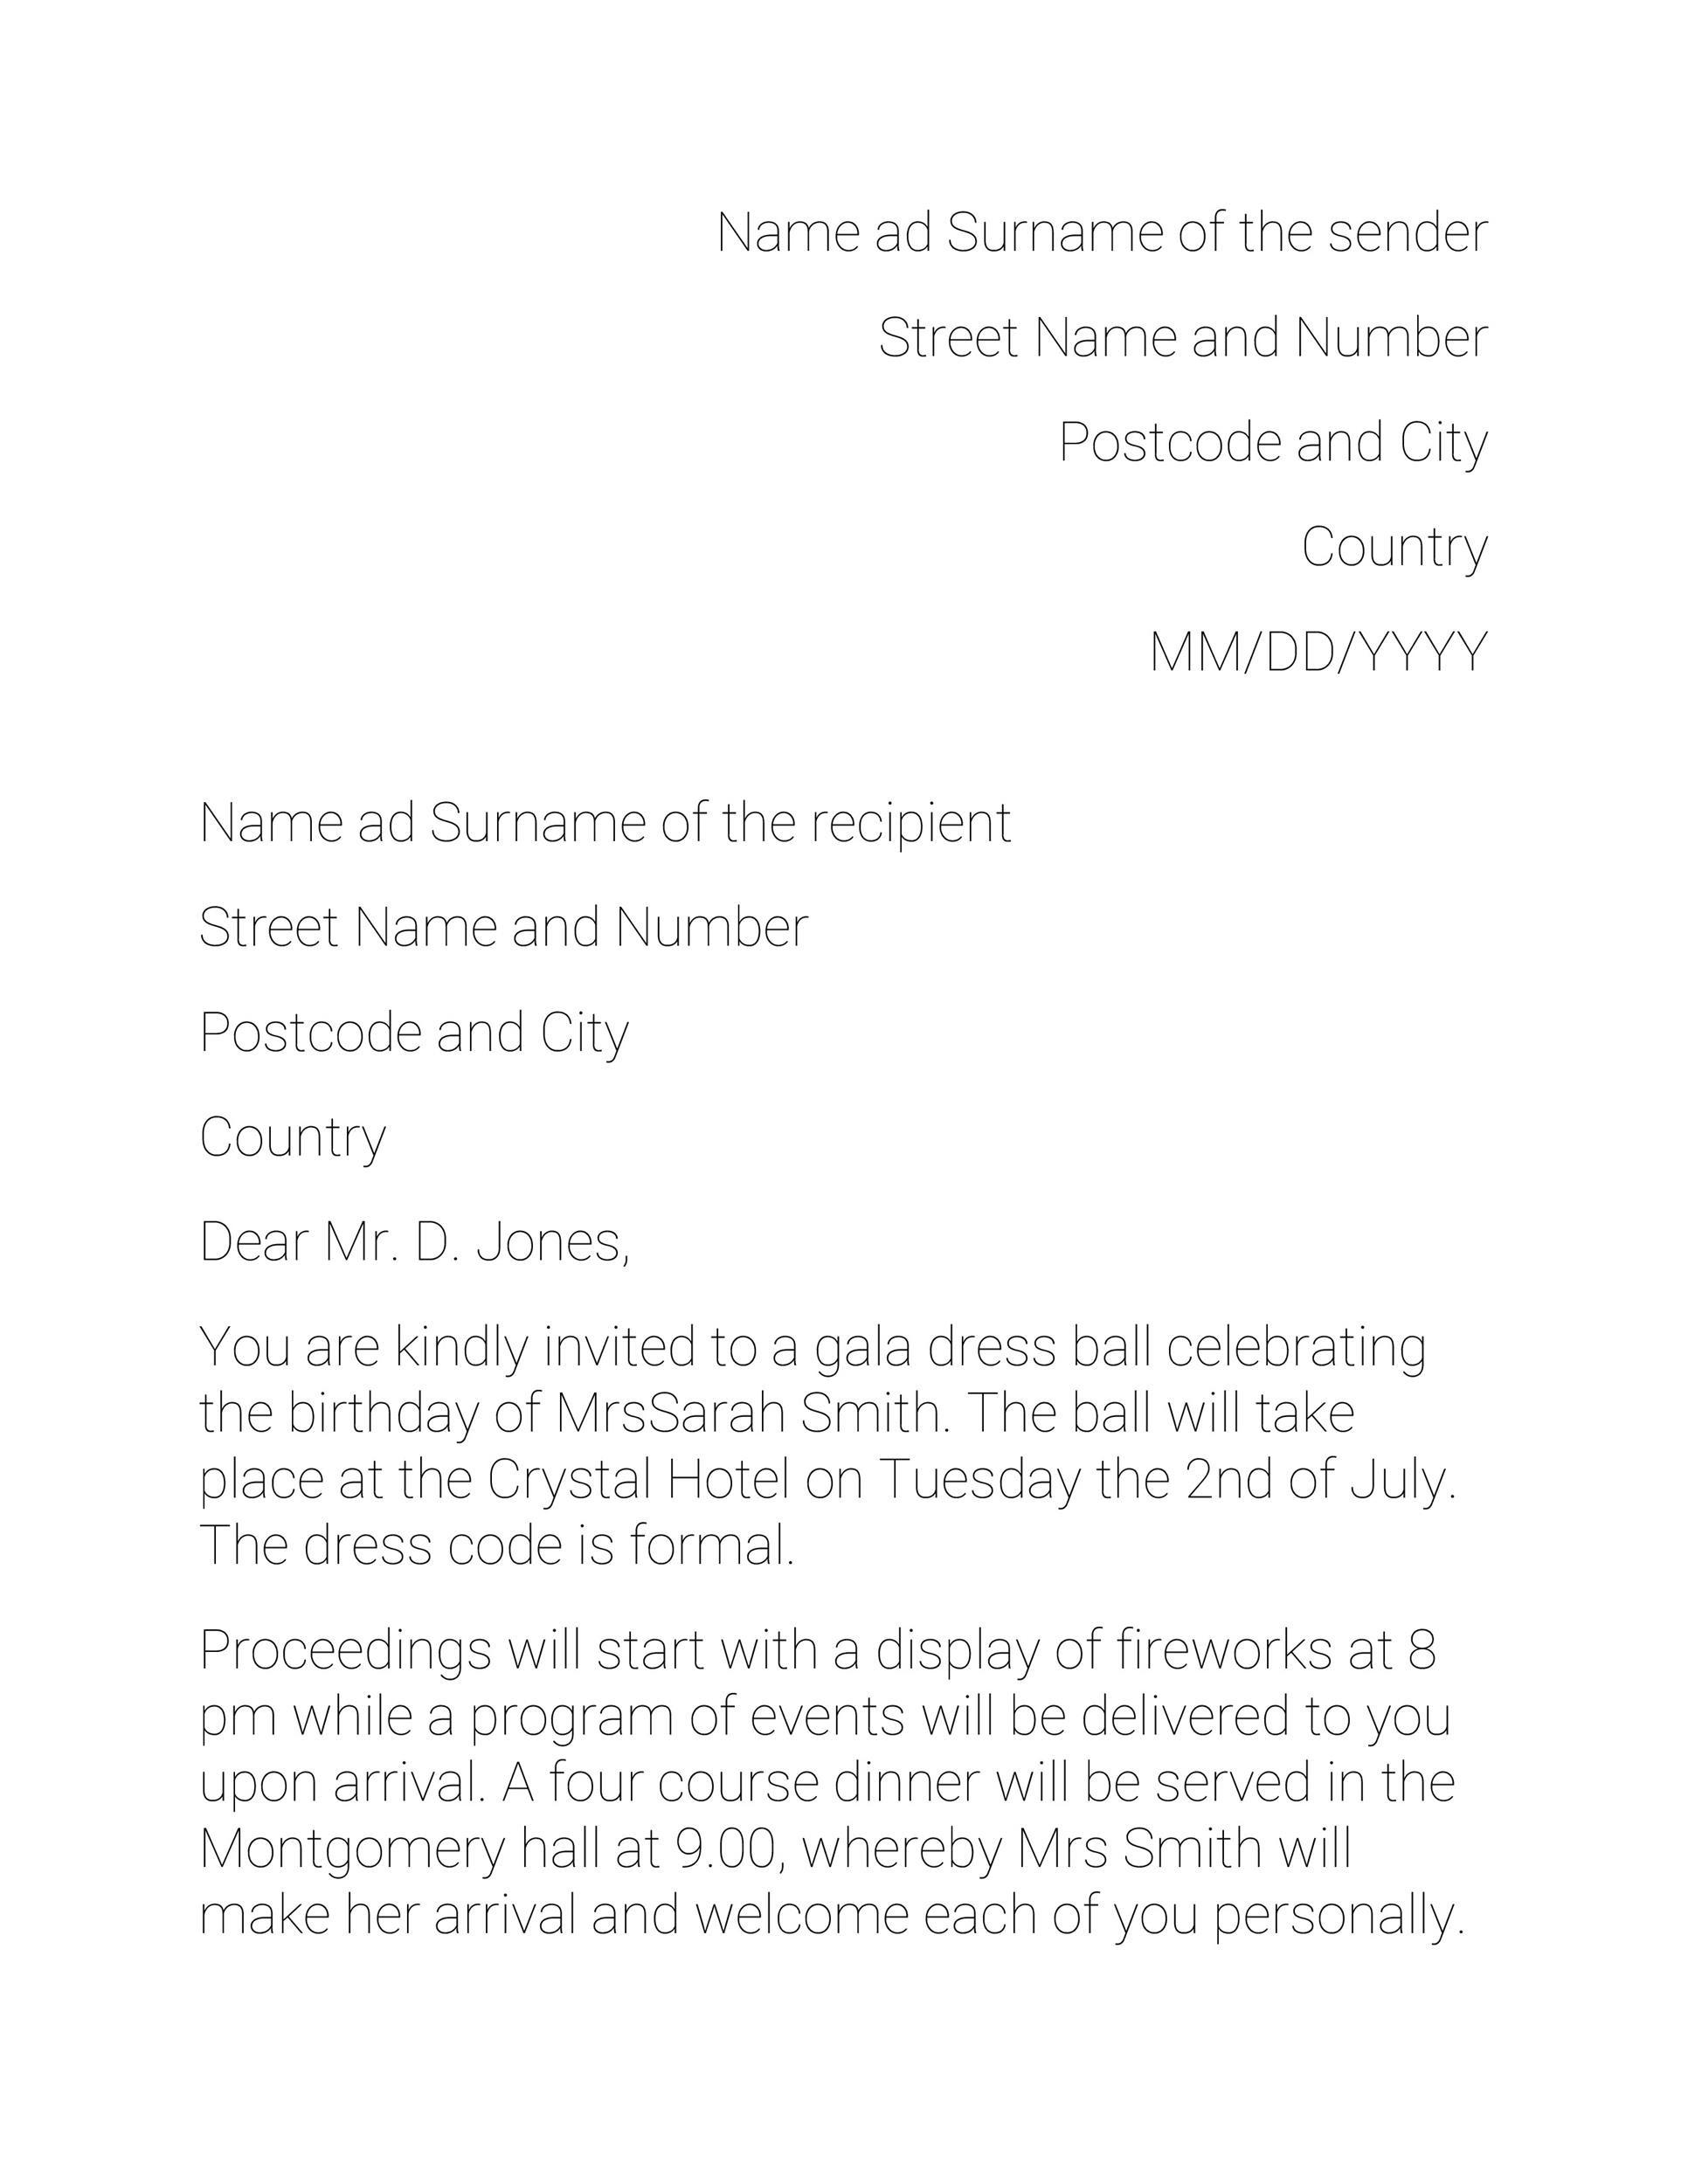 Free invitation letter 49